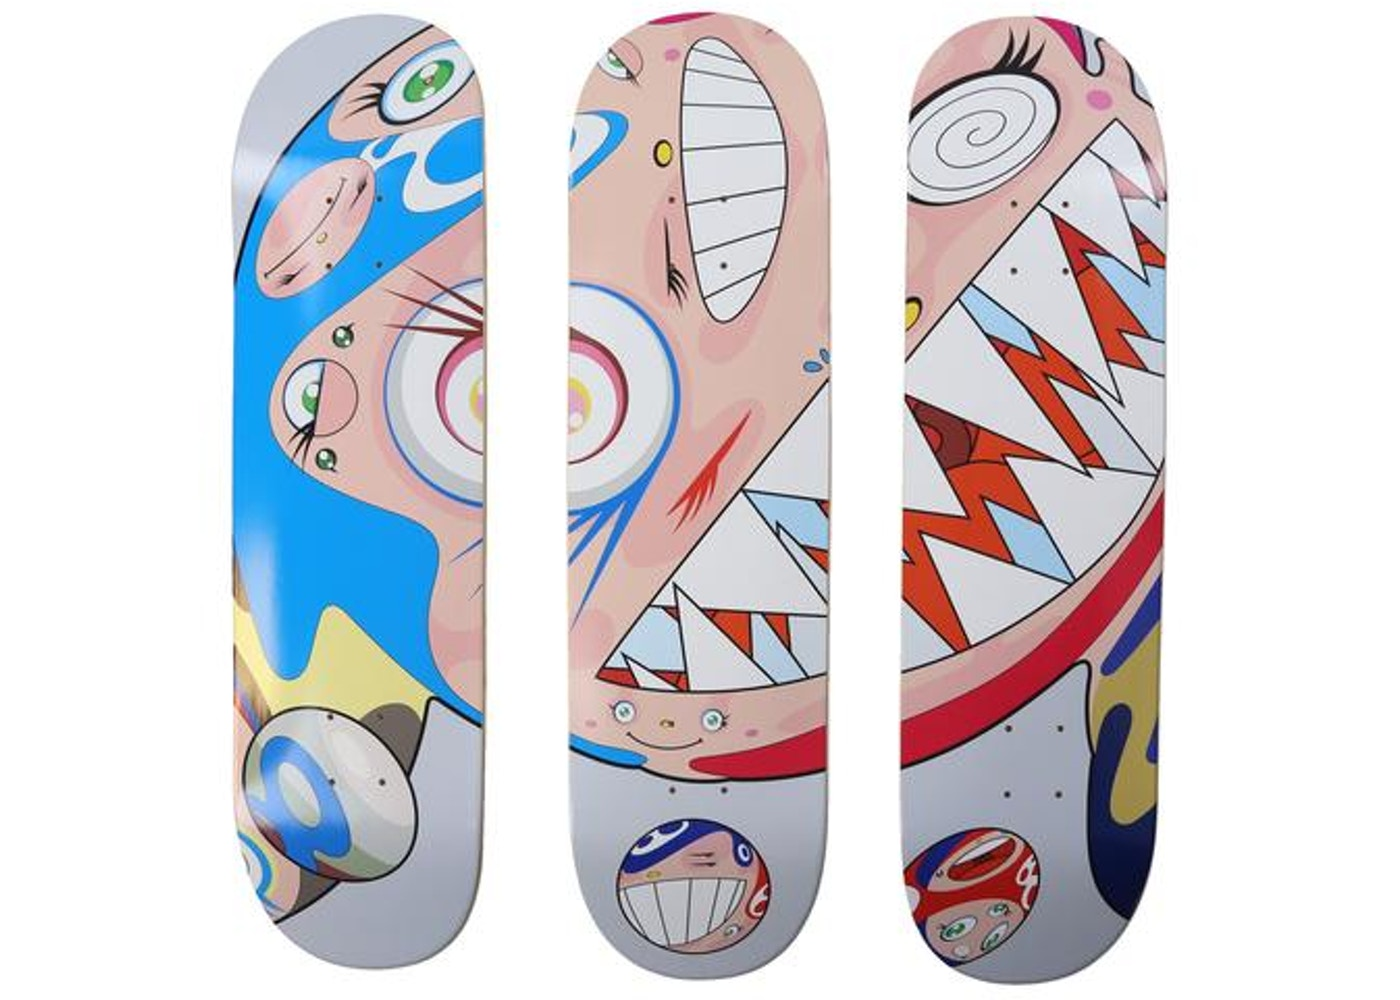 f7b18644 ComplexCon Flying Dob Skateboard Deck Set Multicolor - FW18